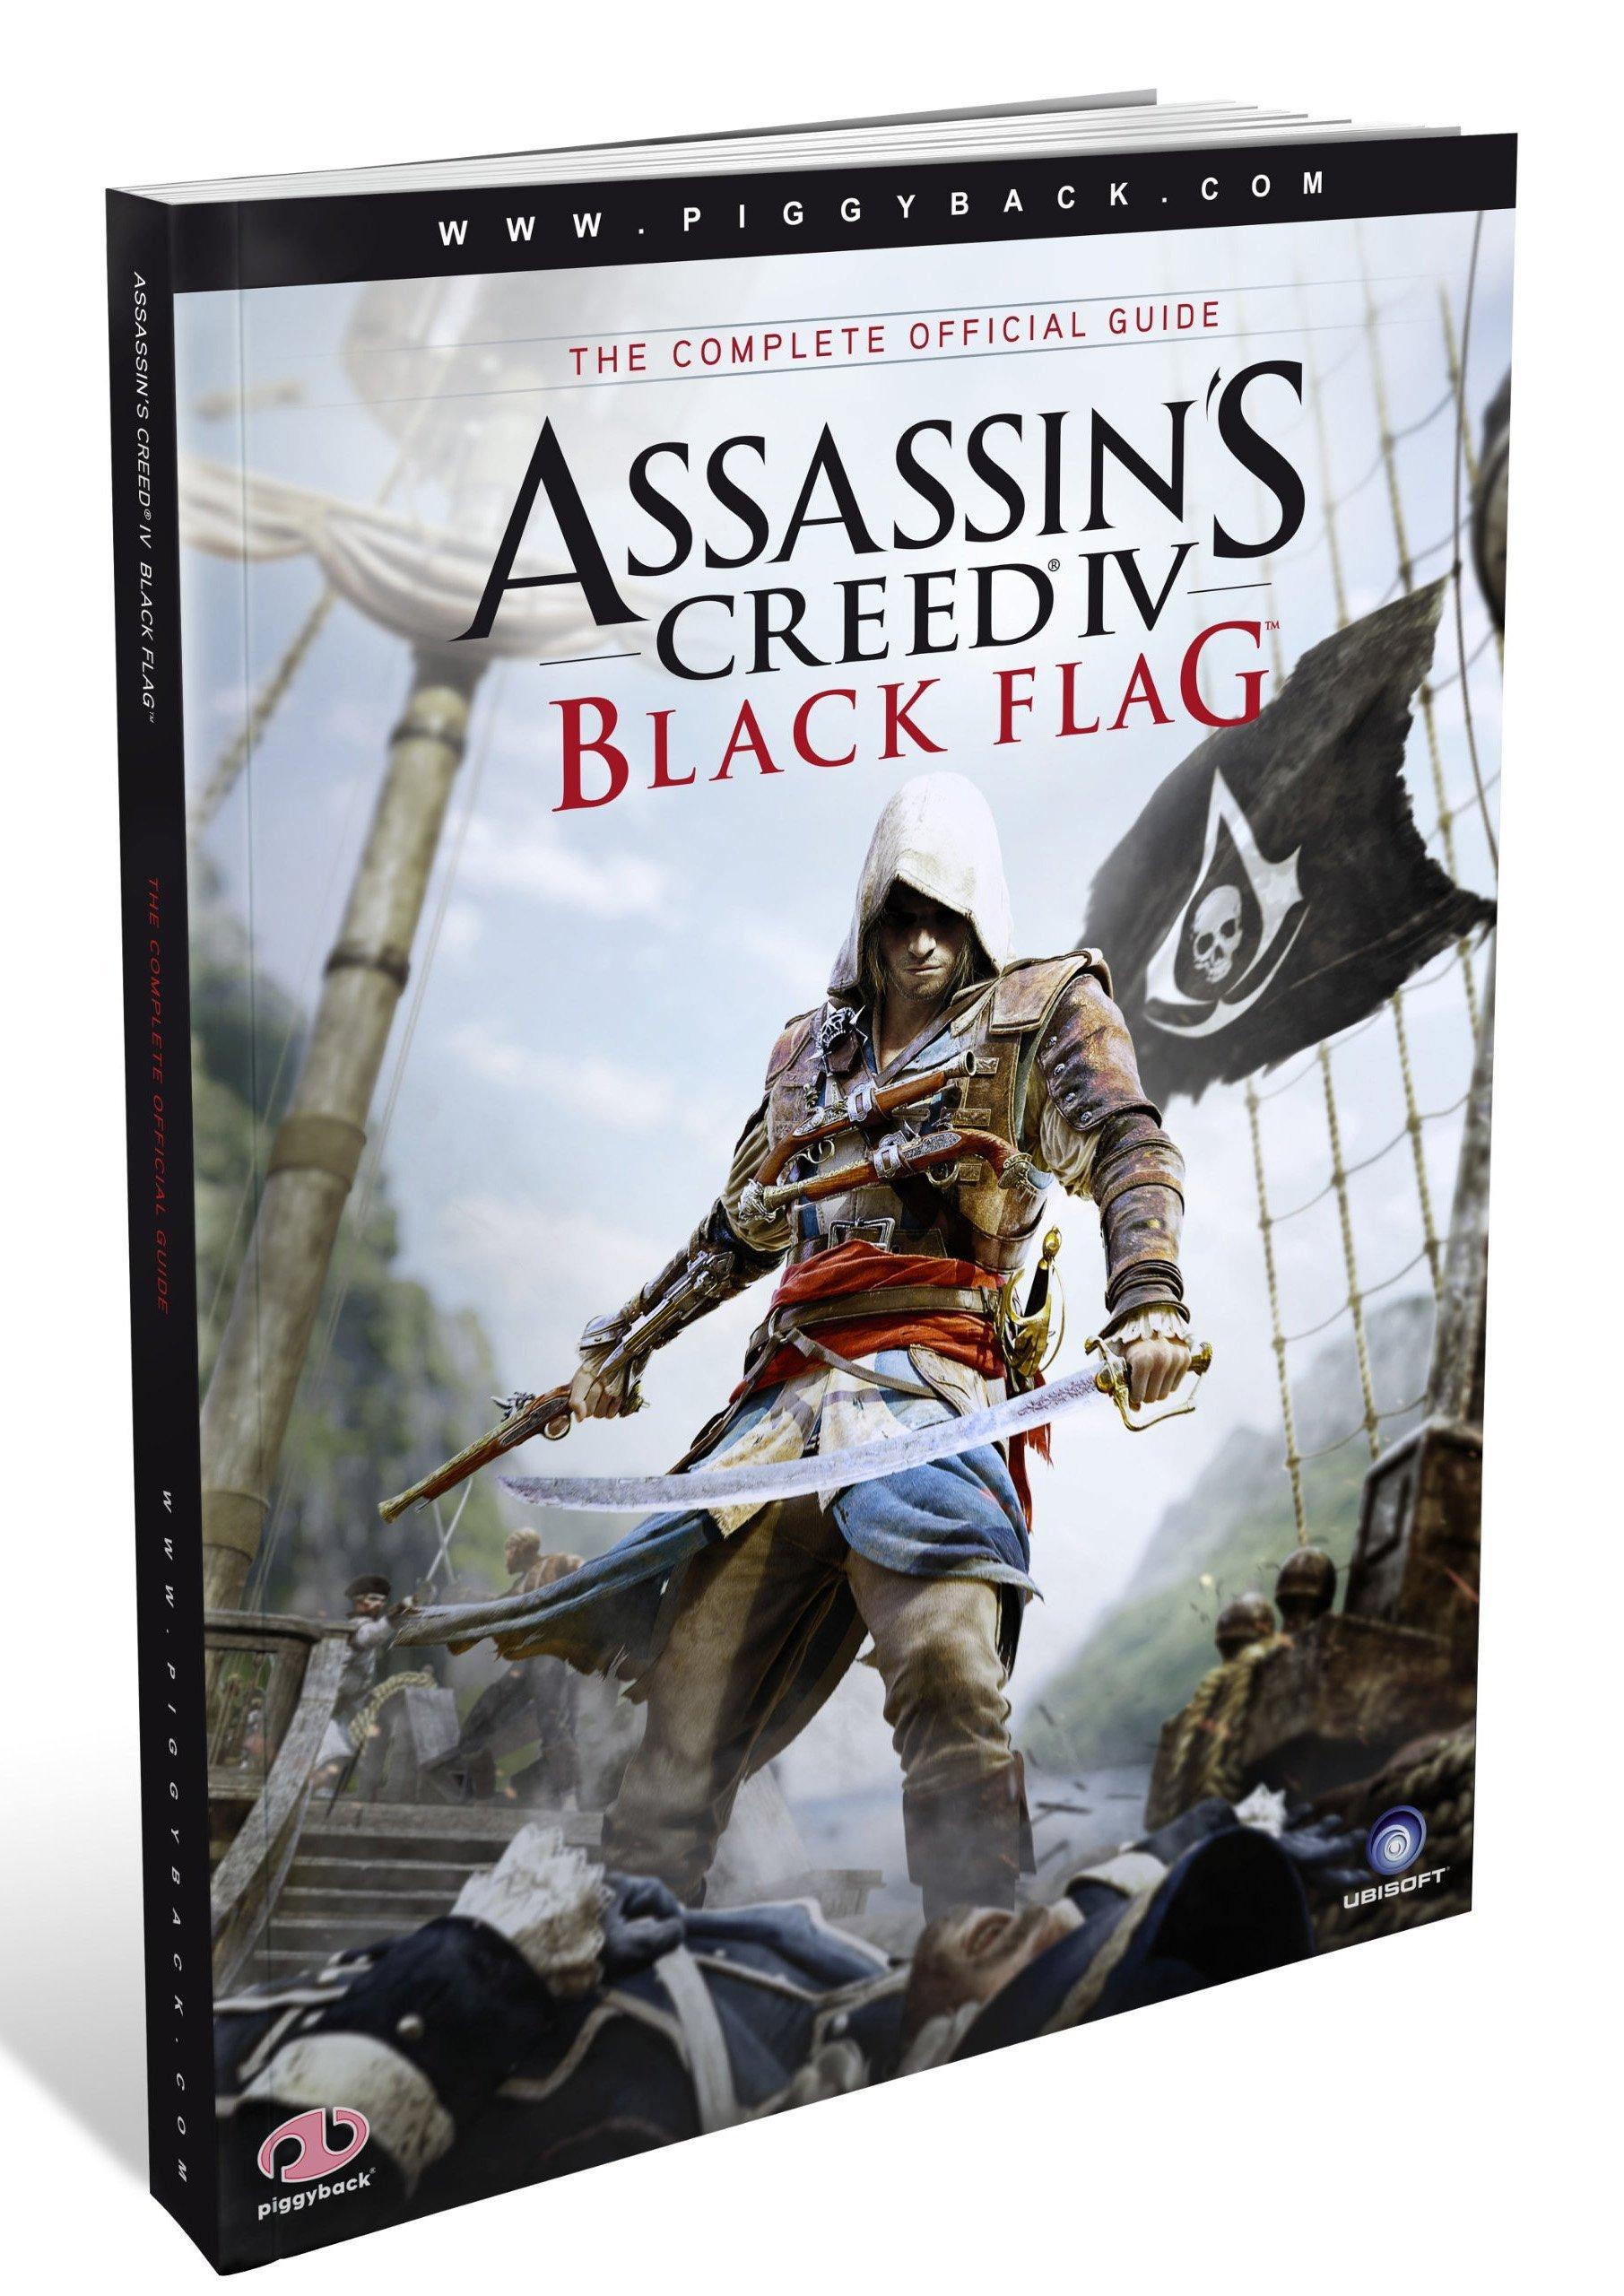 Guía Assassin's Creed IV. Black Flag Tapa blanda – 29 oct 2013 Piggyback Vv.Aa. 190817241X arte